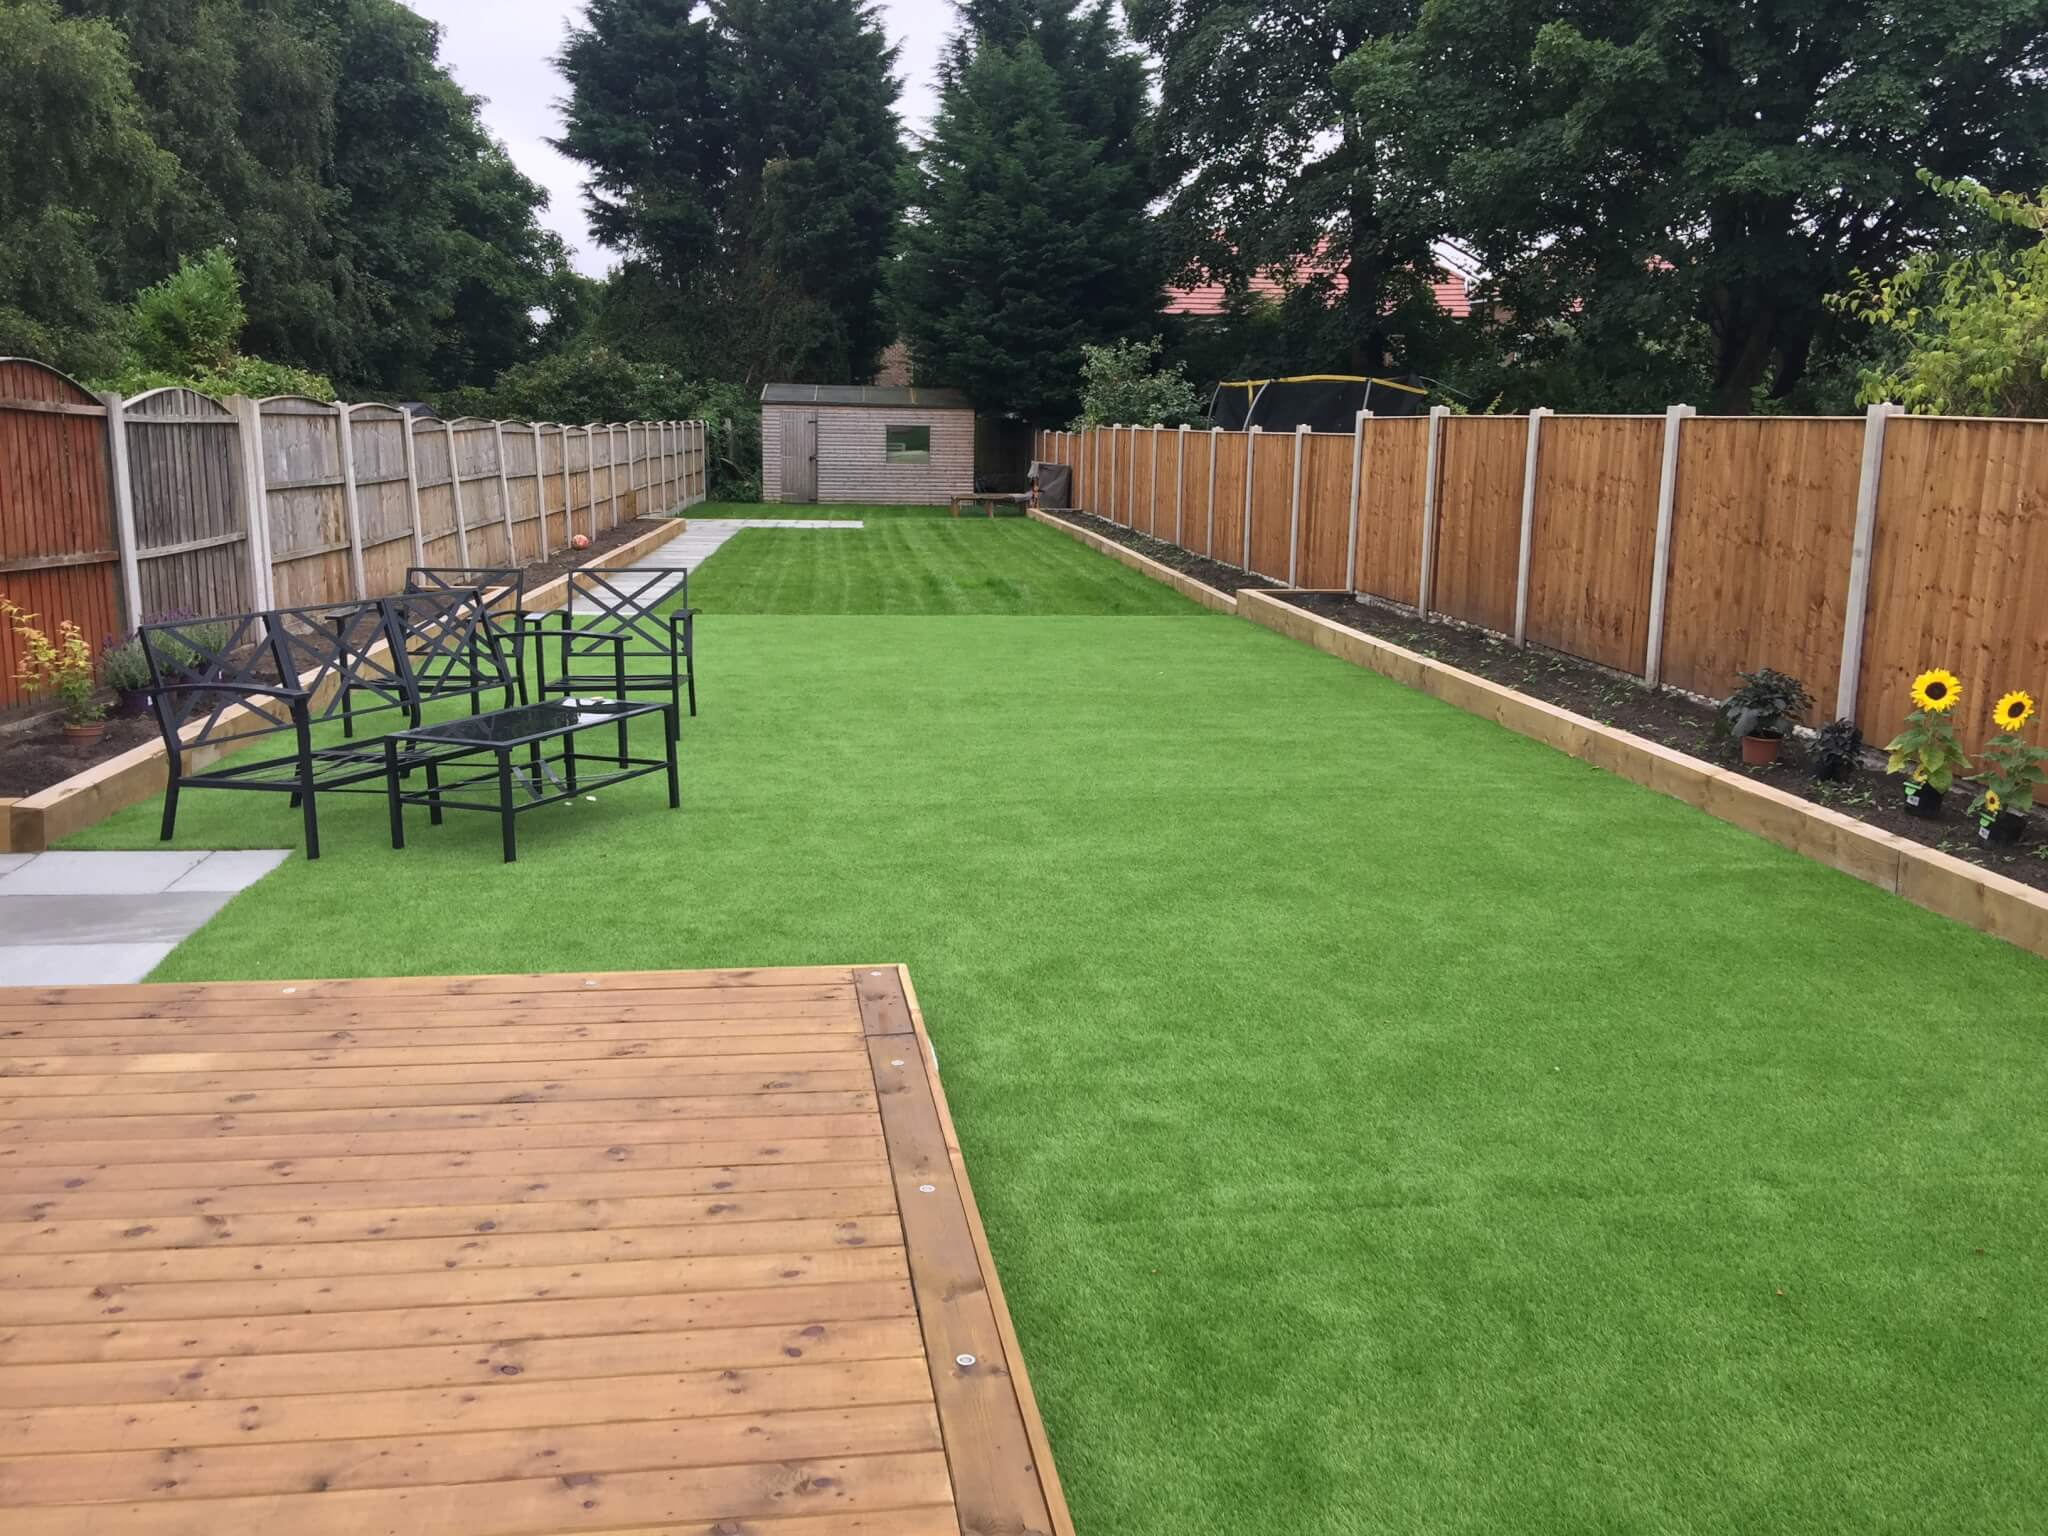 Garden landscape standard decking and artificial grass for Garden ideas with decking and grass